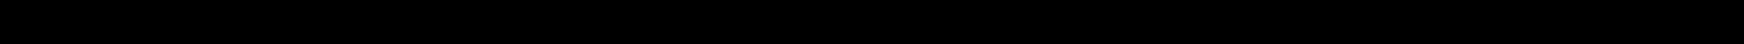 BelizioGreek-Italic.otf